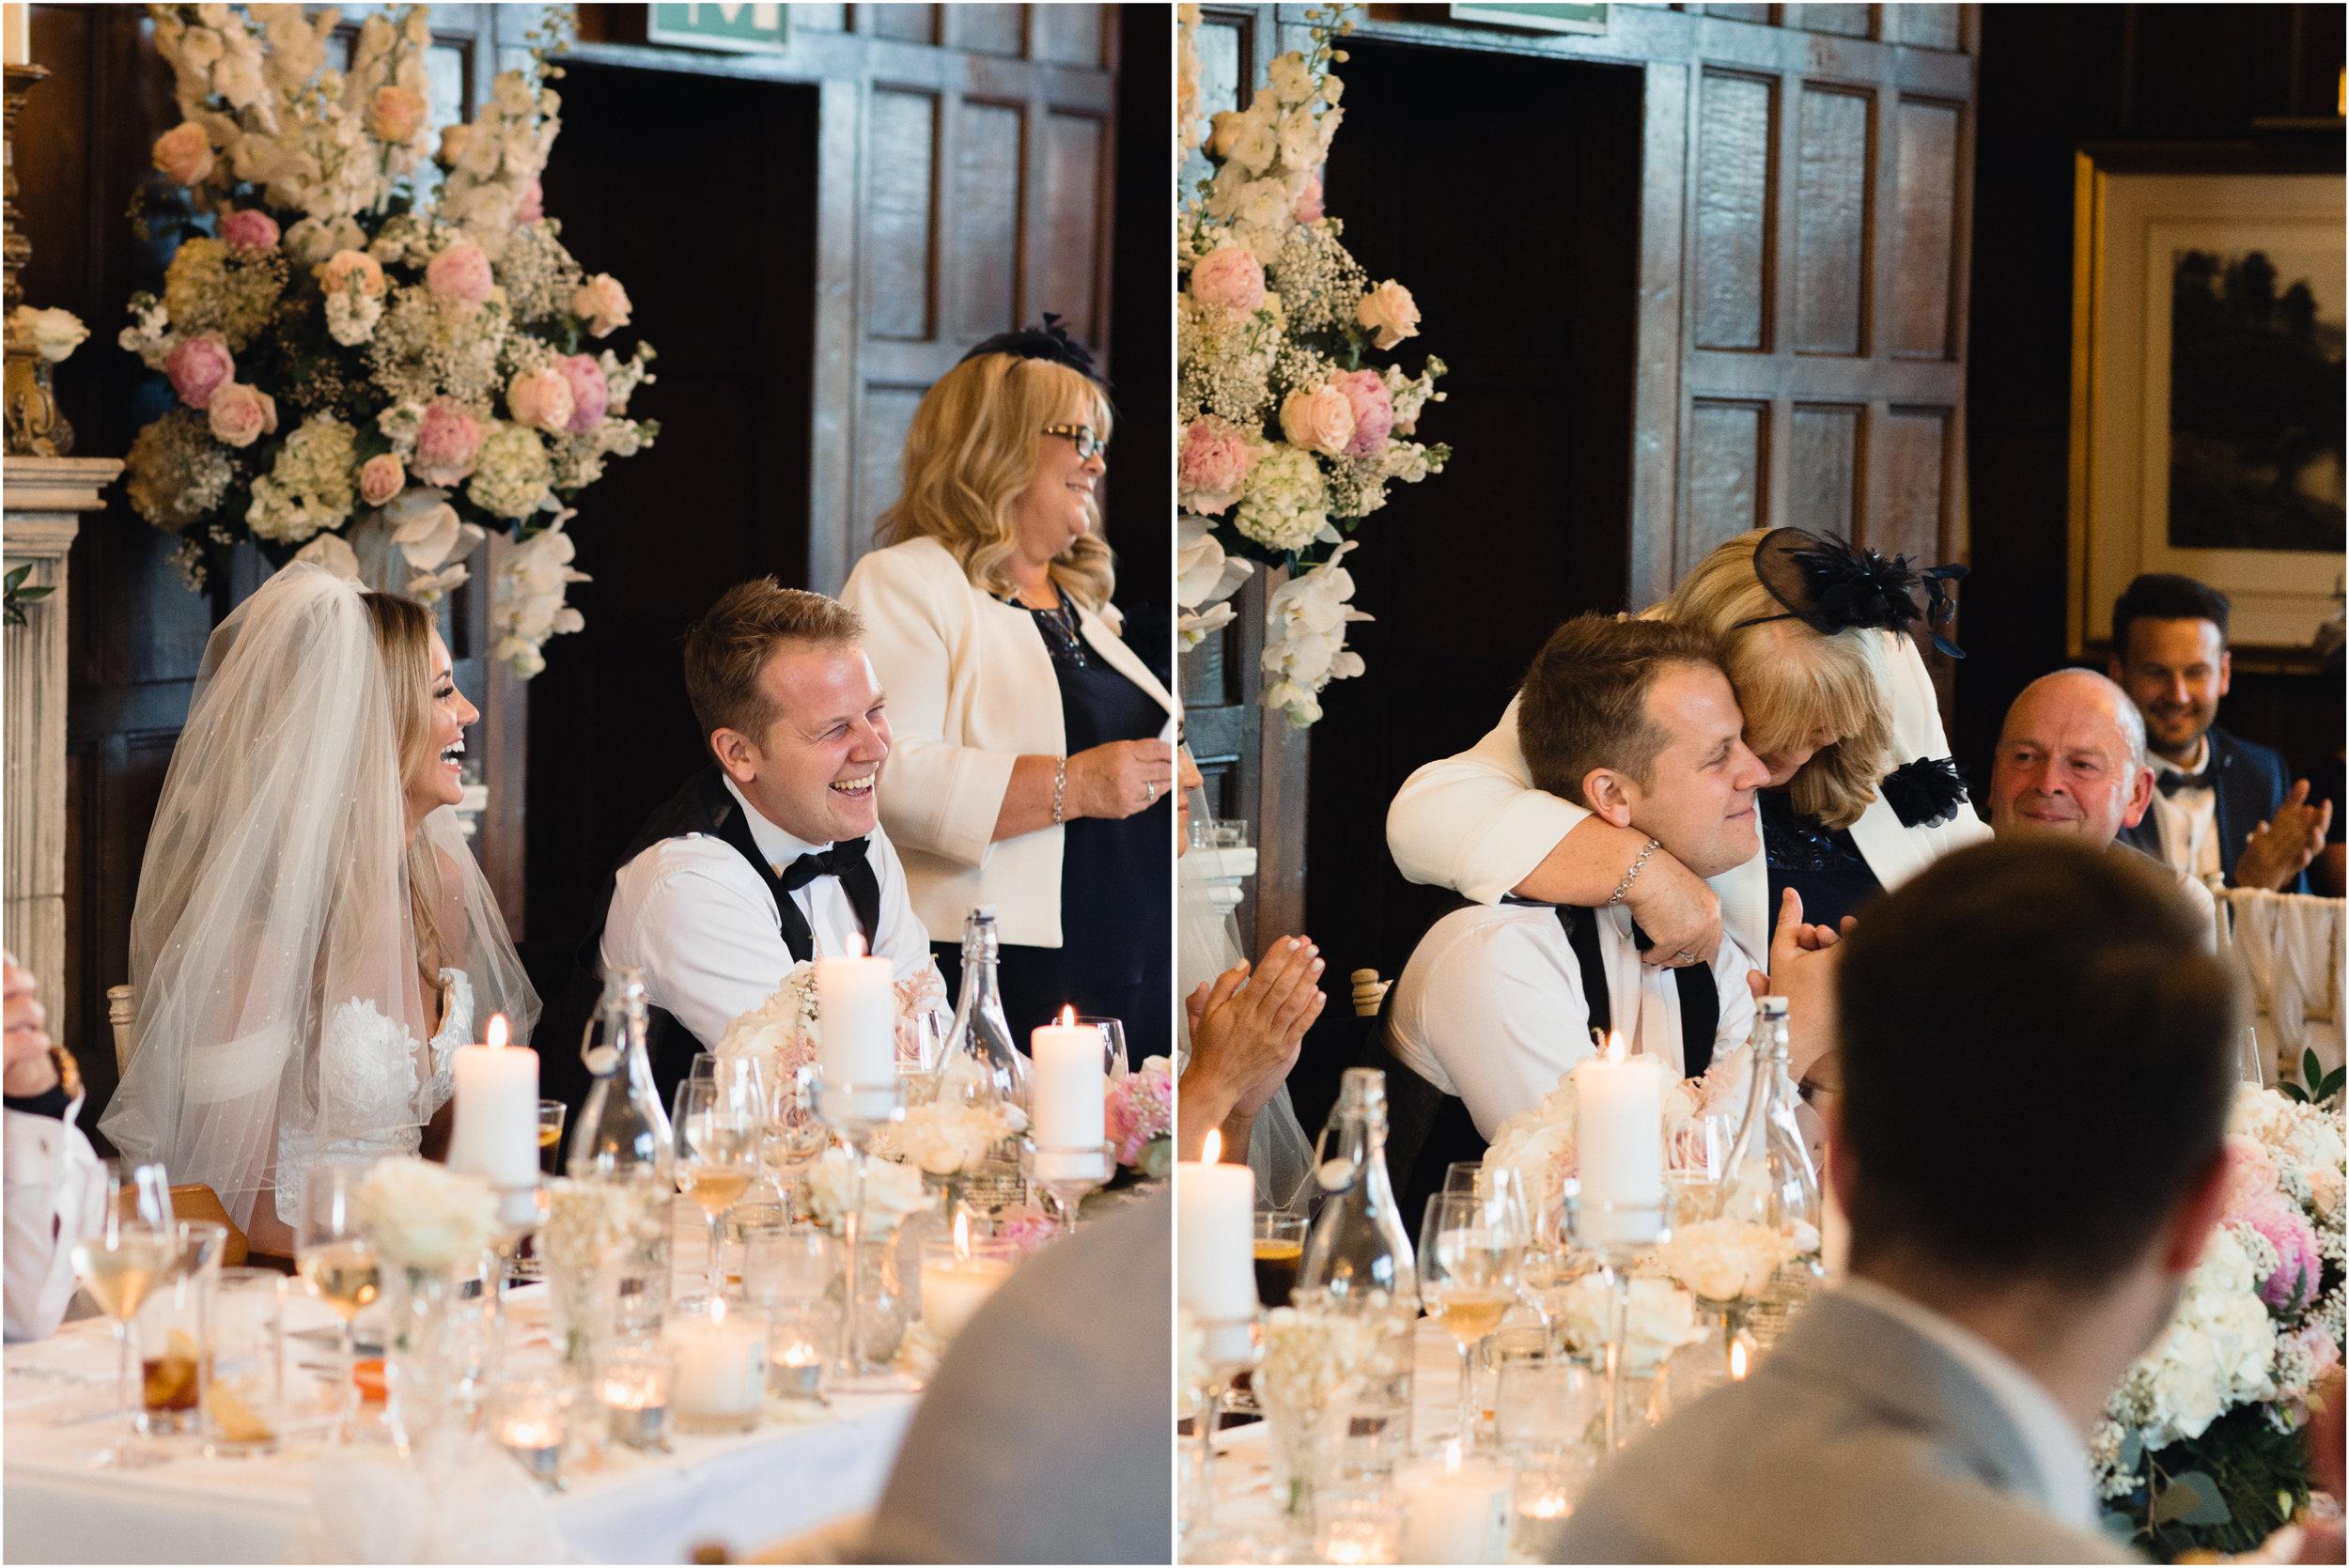 Rebecca Searle Wedding Photography Surrey London Luxury 69.jpg